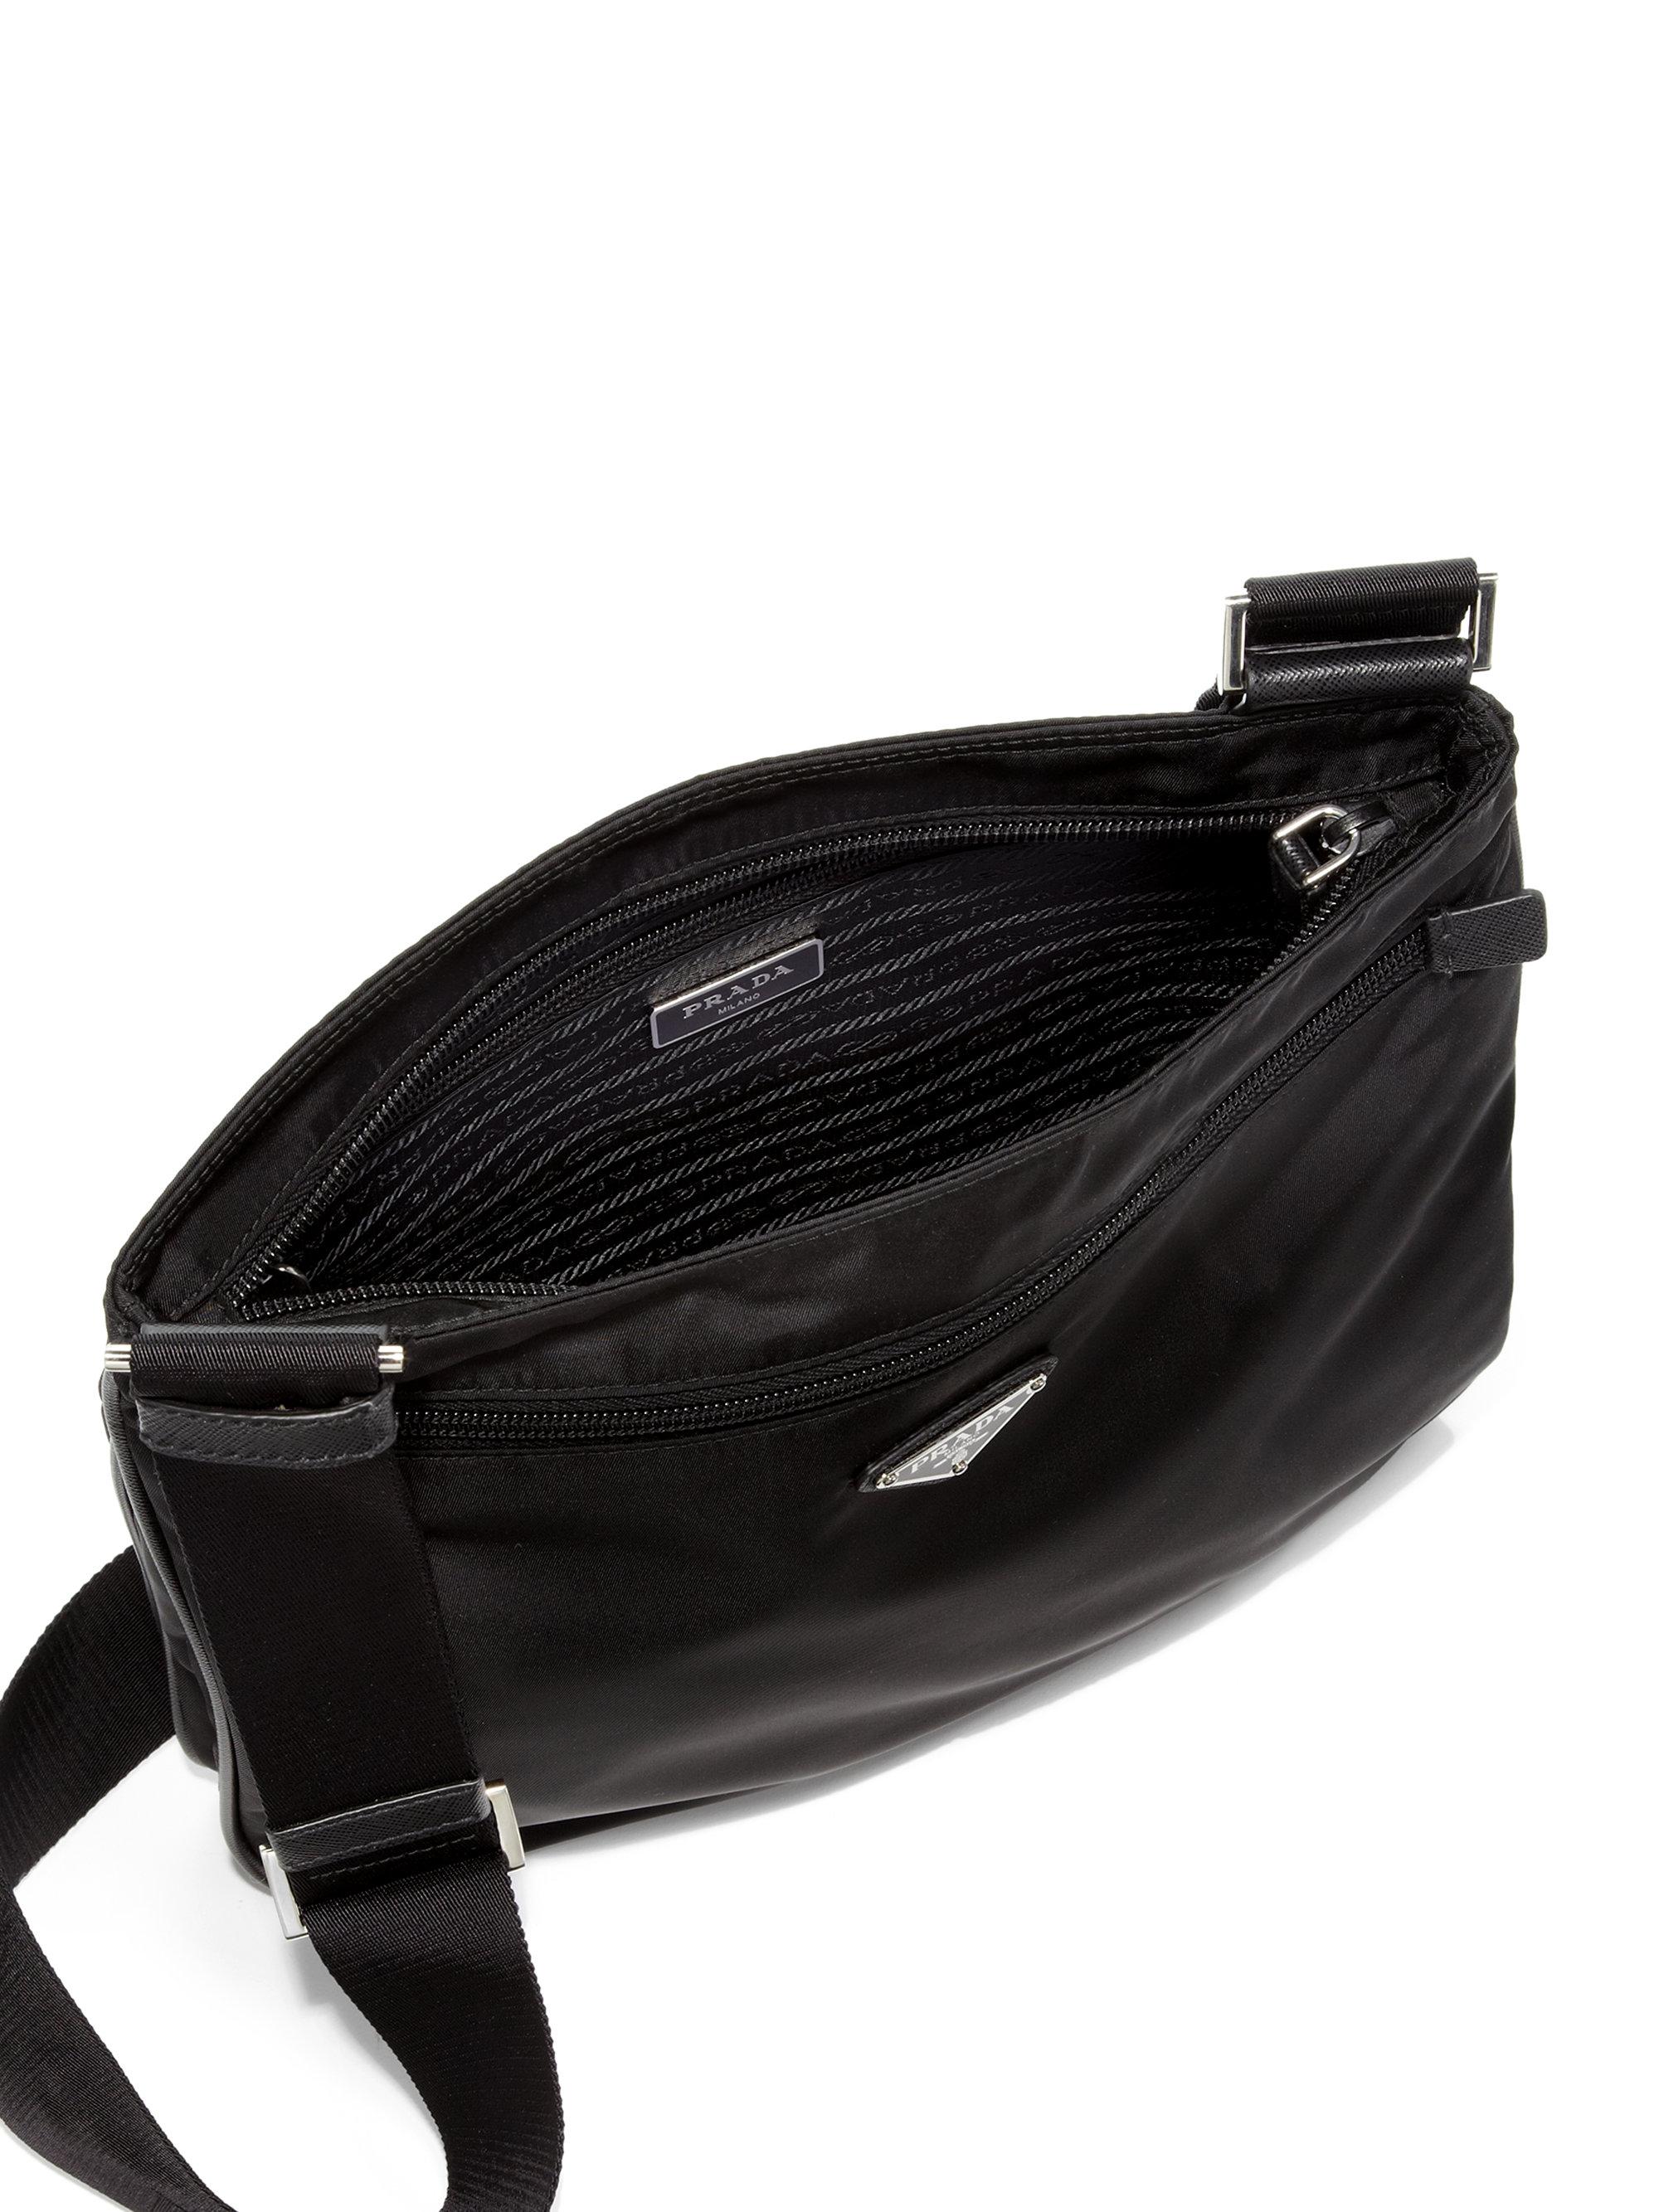 a013fb5c7df5 ... italy lyst prada nylon messenger bag in black for men 0b51f 2bbba